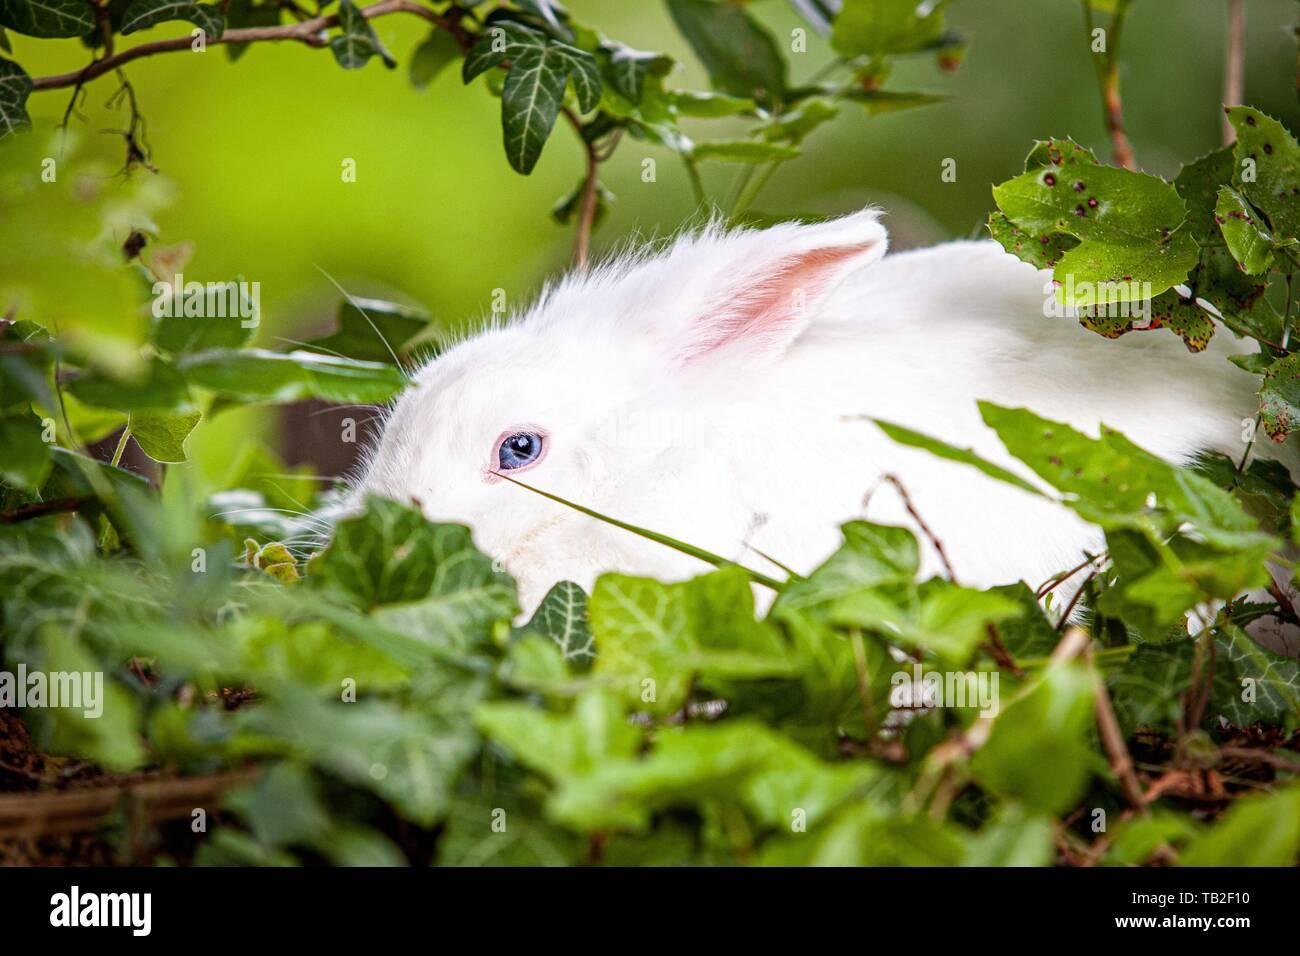 Conejo enano blanco Foto de stock